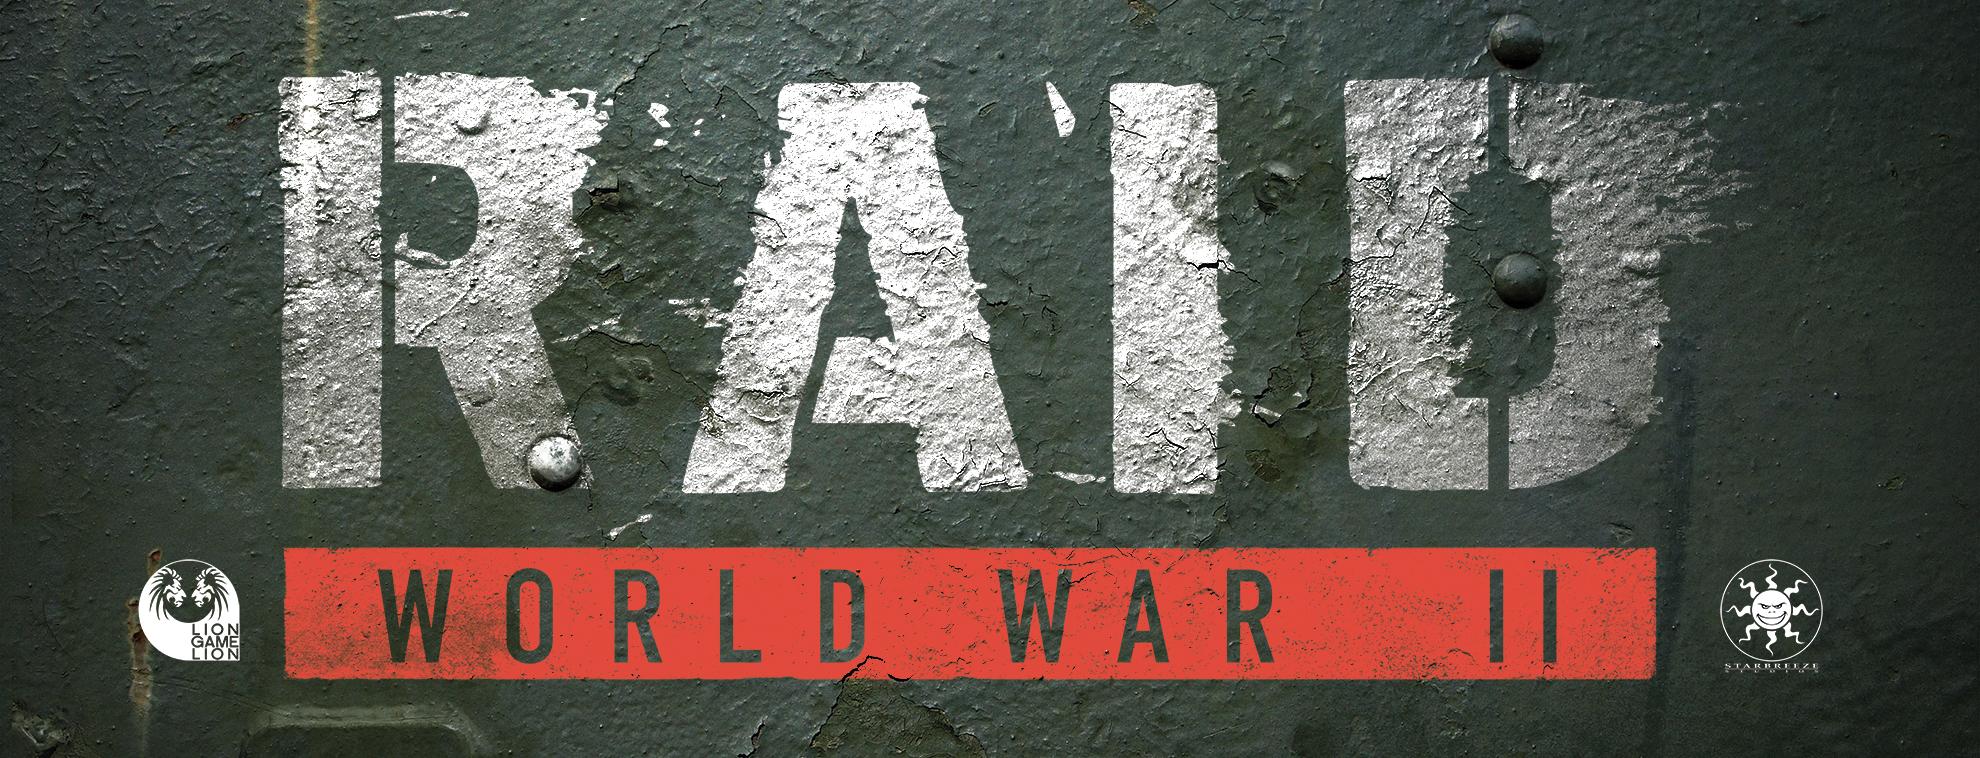 RAID: World War II klade velký důraz na kooperaci 129185